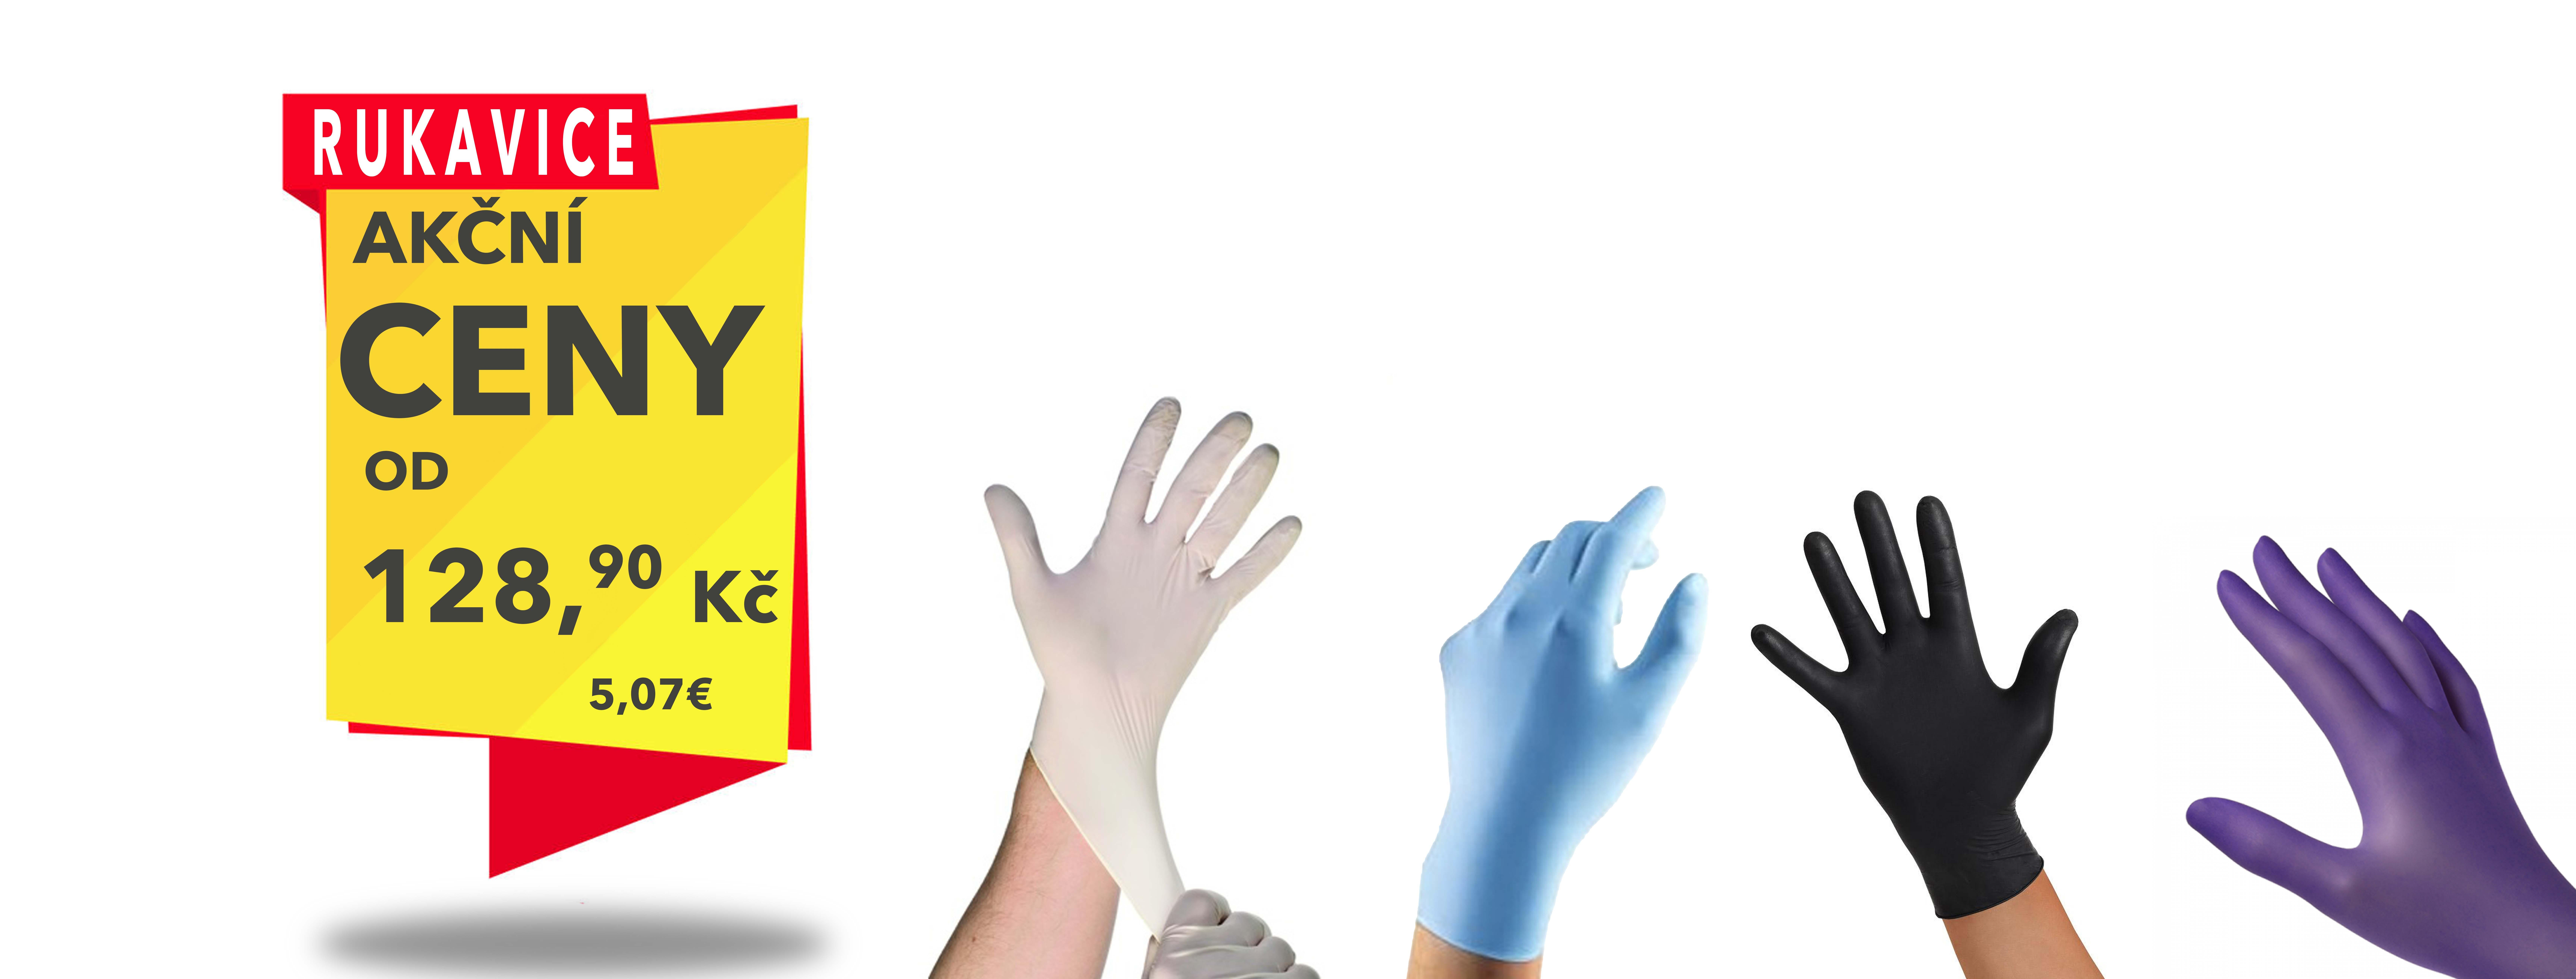 Sleva rukavice